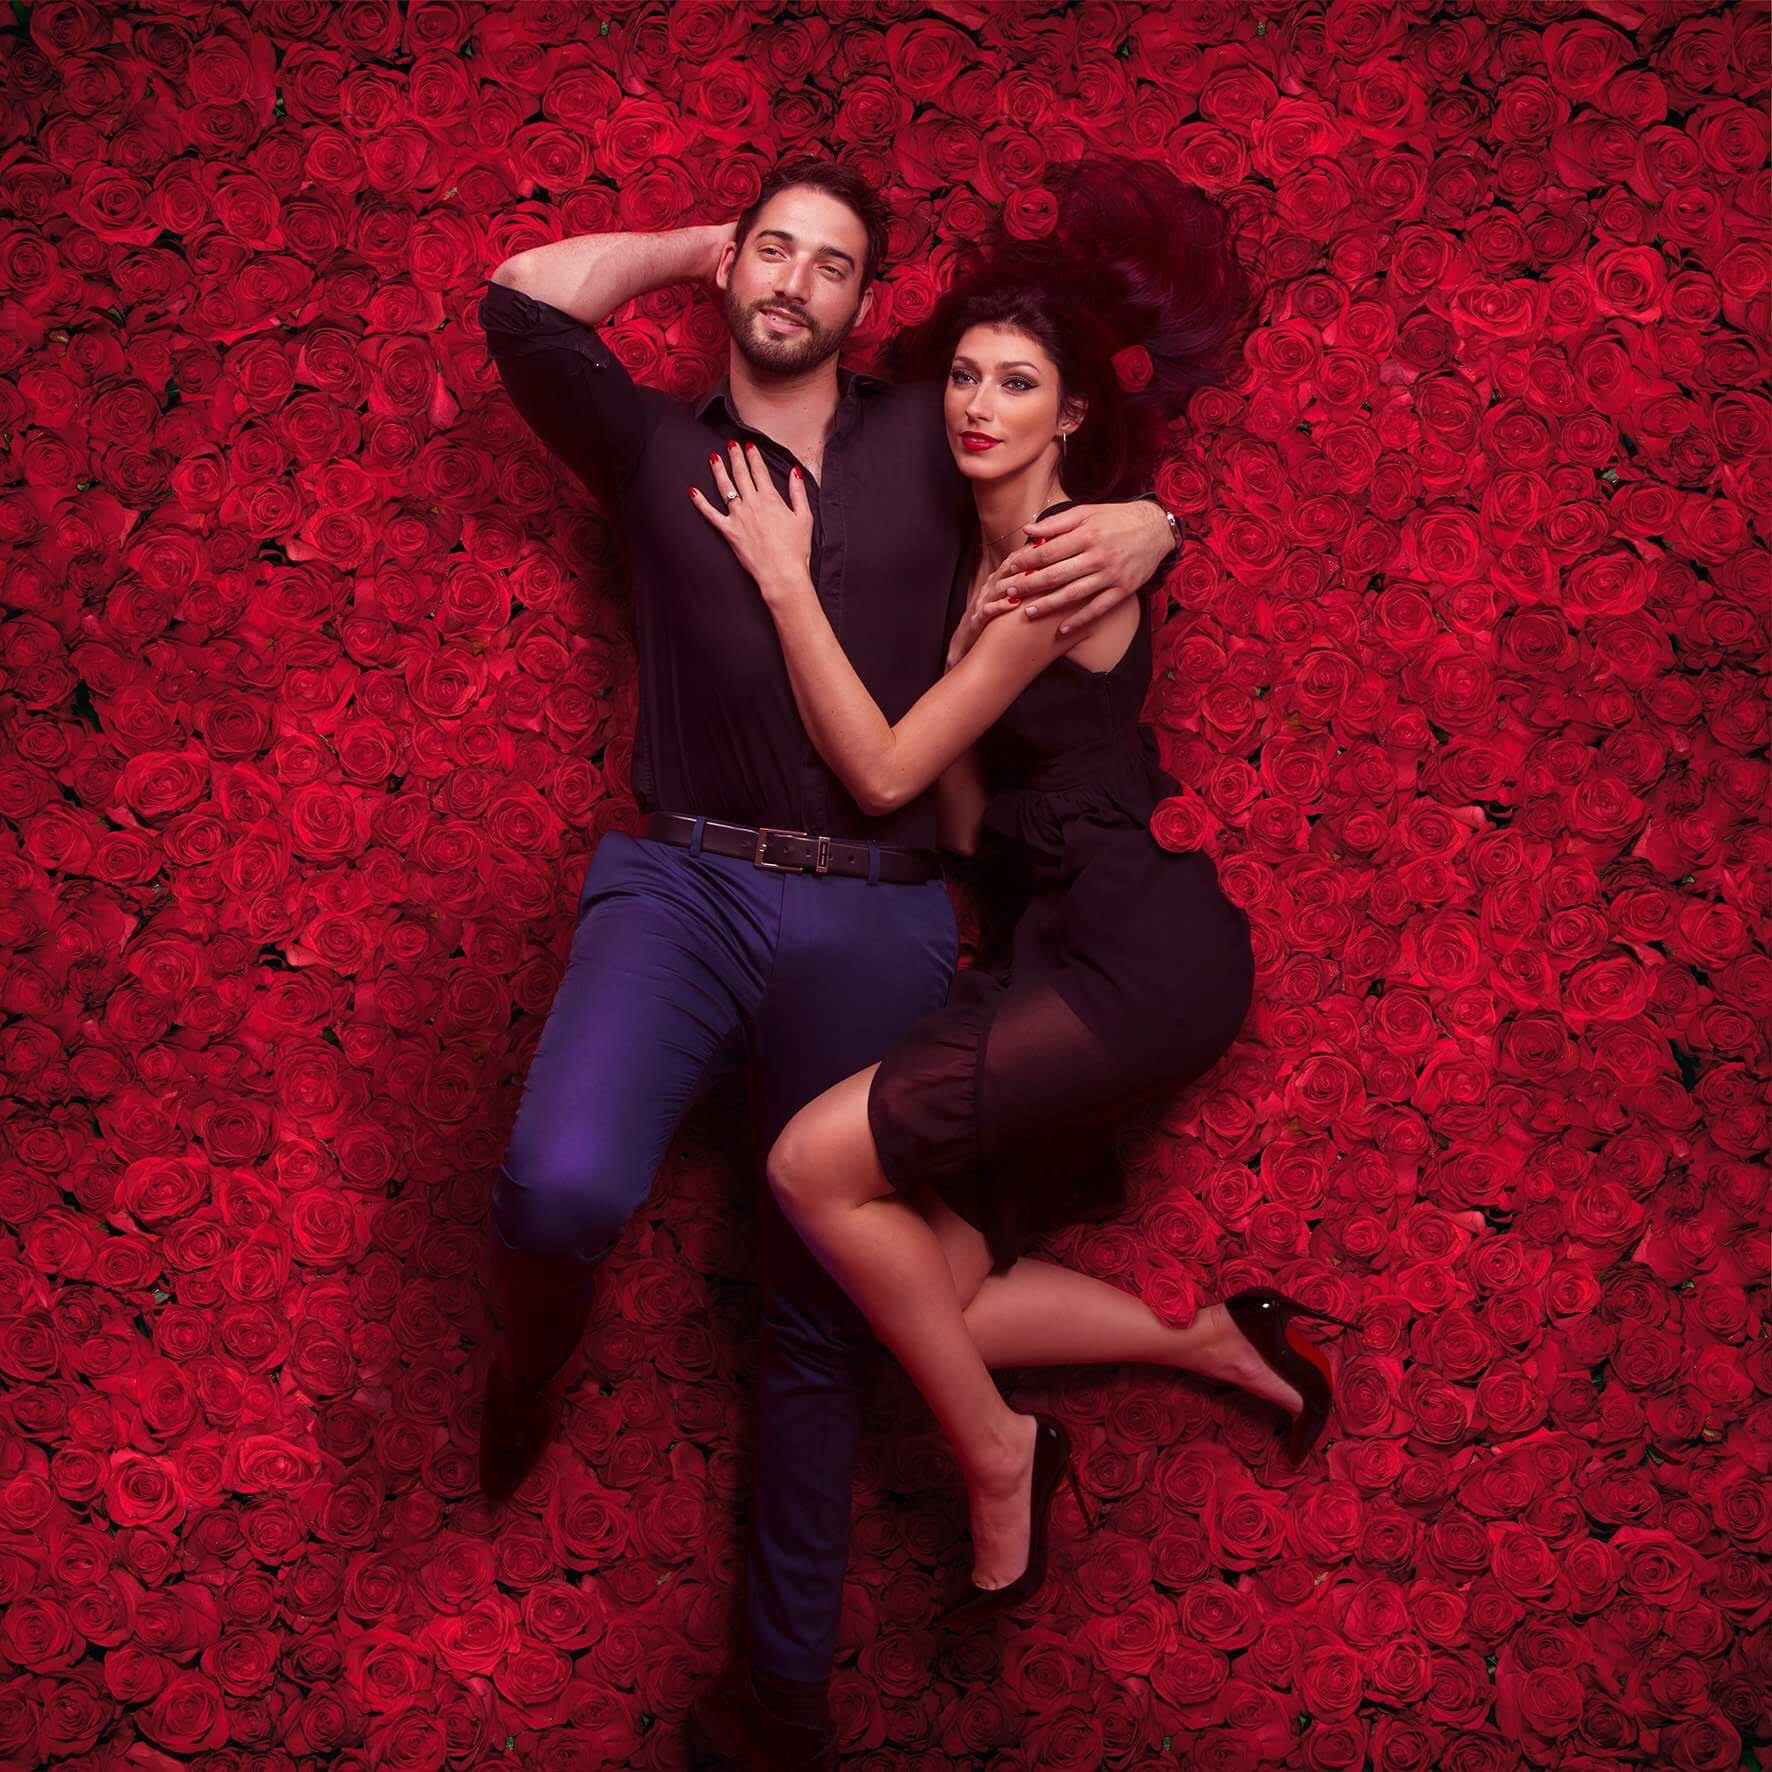 Sophie et Fabien Rose